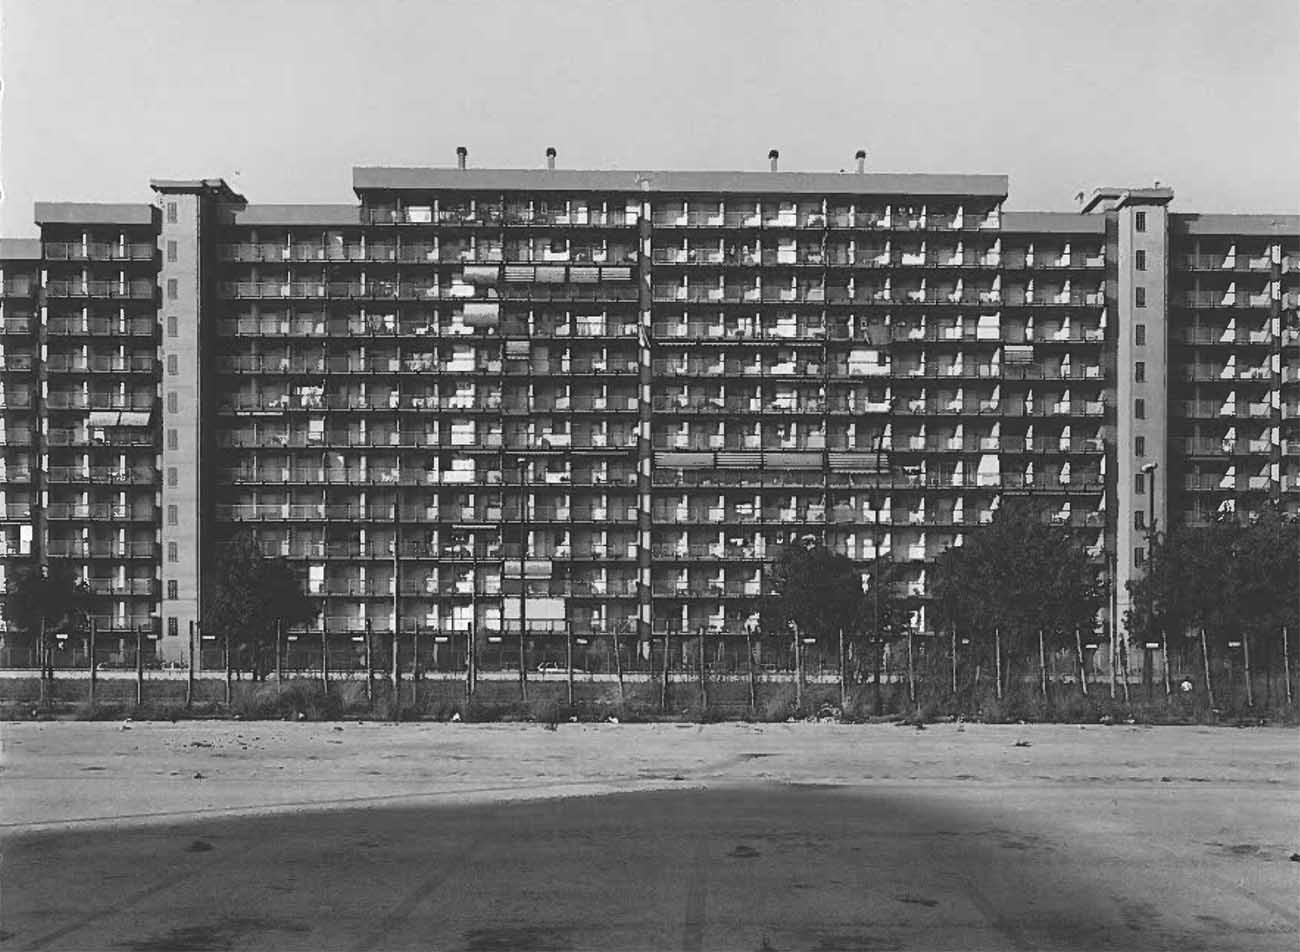 Studio Architettura Paesaggio Milano italy: cross sections of a country | gabriele basilico e